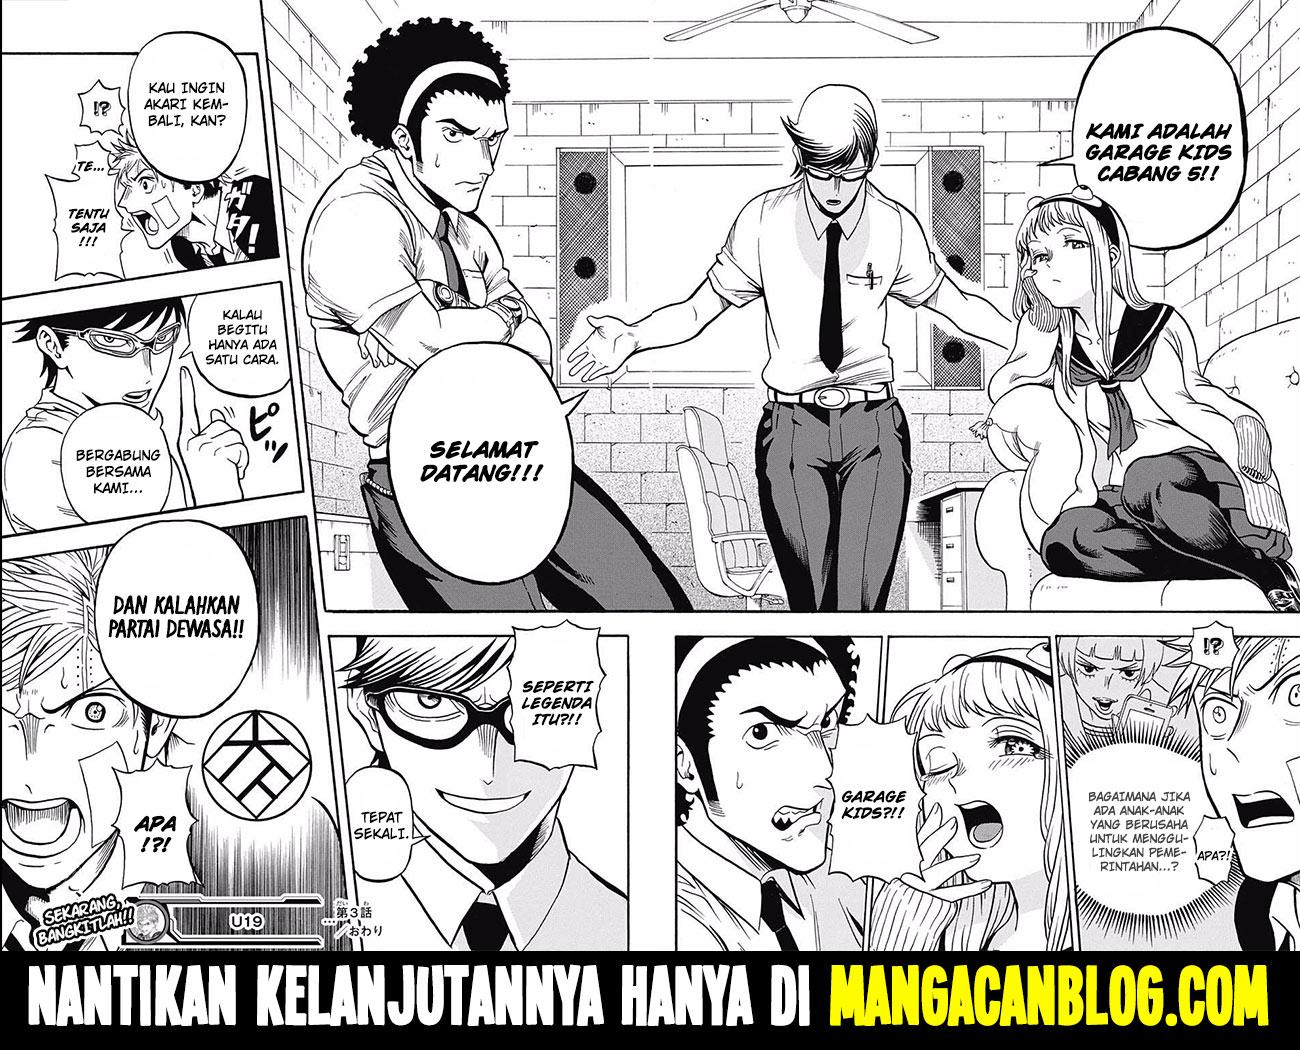 Dilarang COPAS - situs resmi www.mangacanblog.com - Komik u19 003 - libido 4 Indonesia u19 003 - libido Terbaru 21|Baca Manga Komik Indonesia|Mangacan